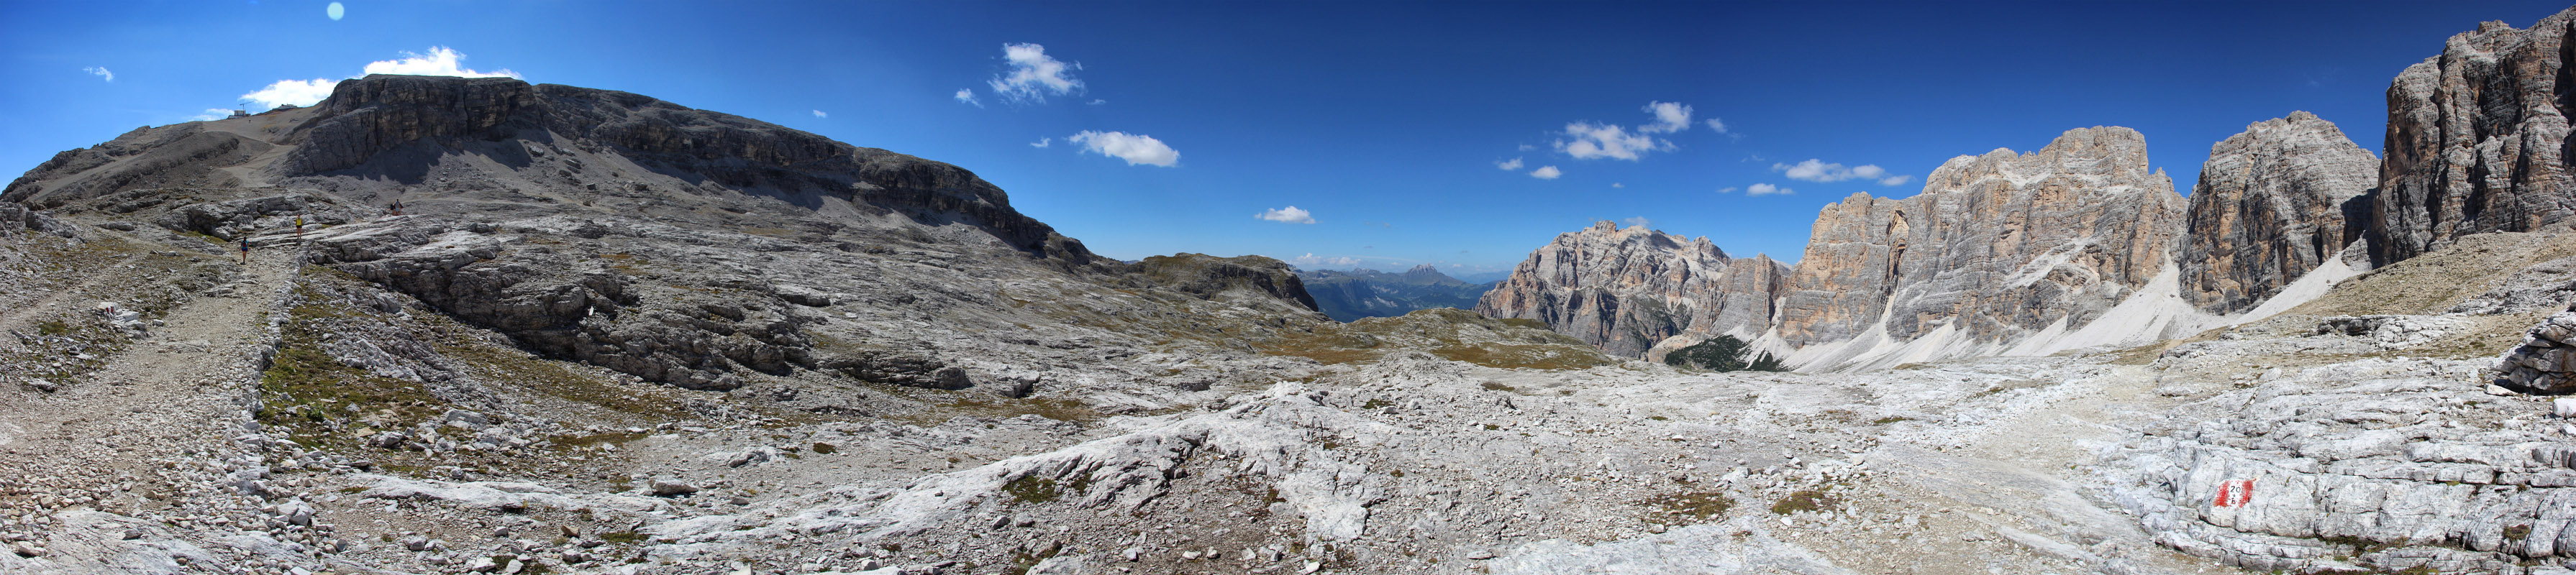 Panoráma Lagazuoi, Piza de Lech, Cima Scotoni a Cima Fanes, Dolomity